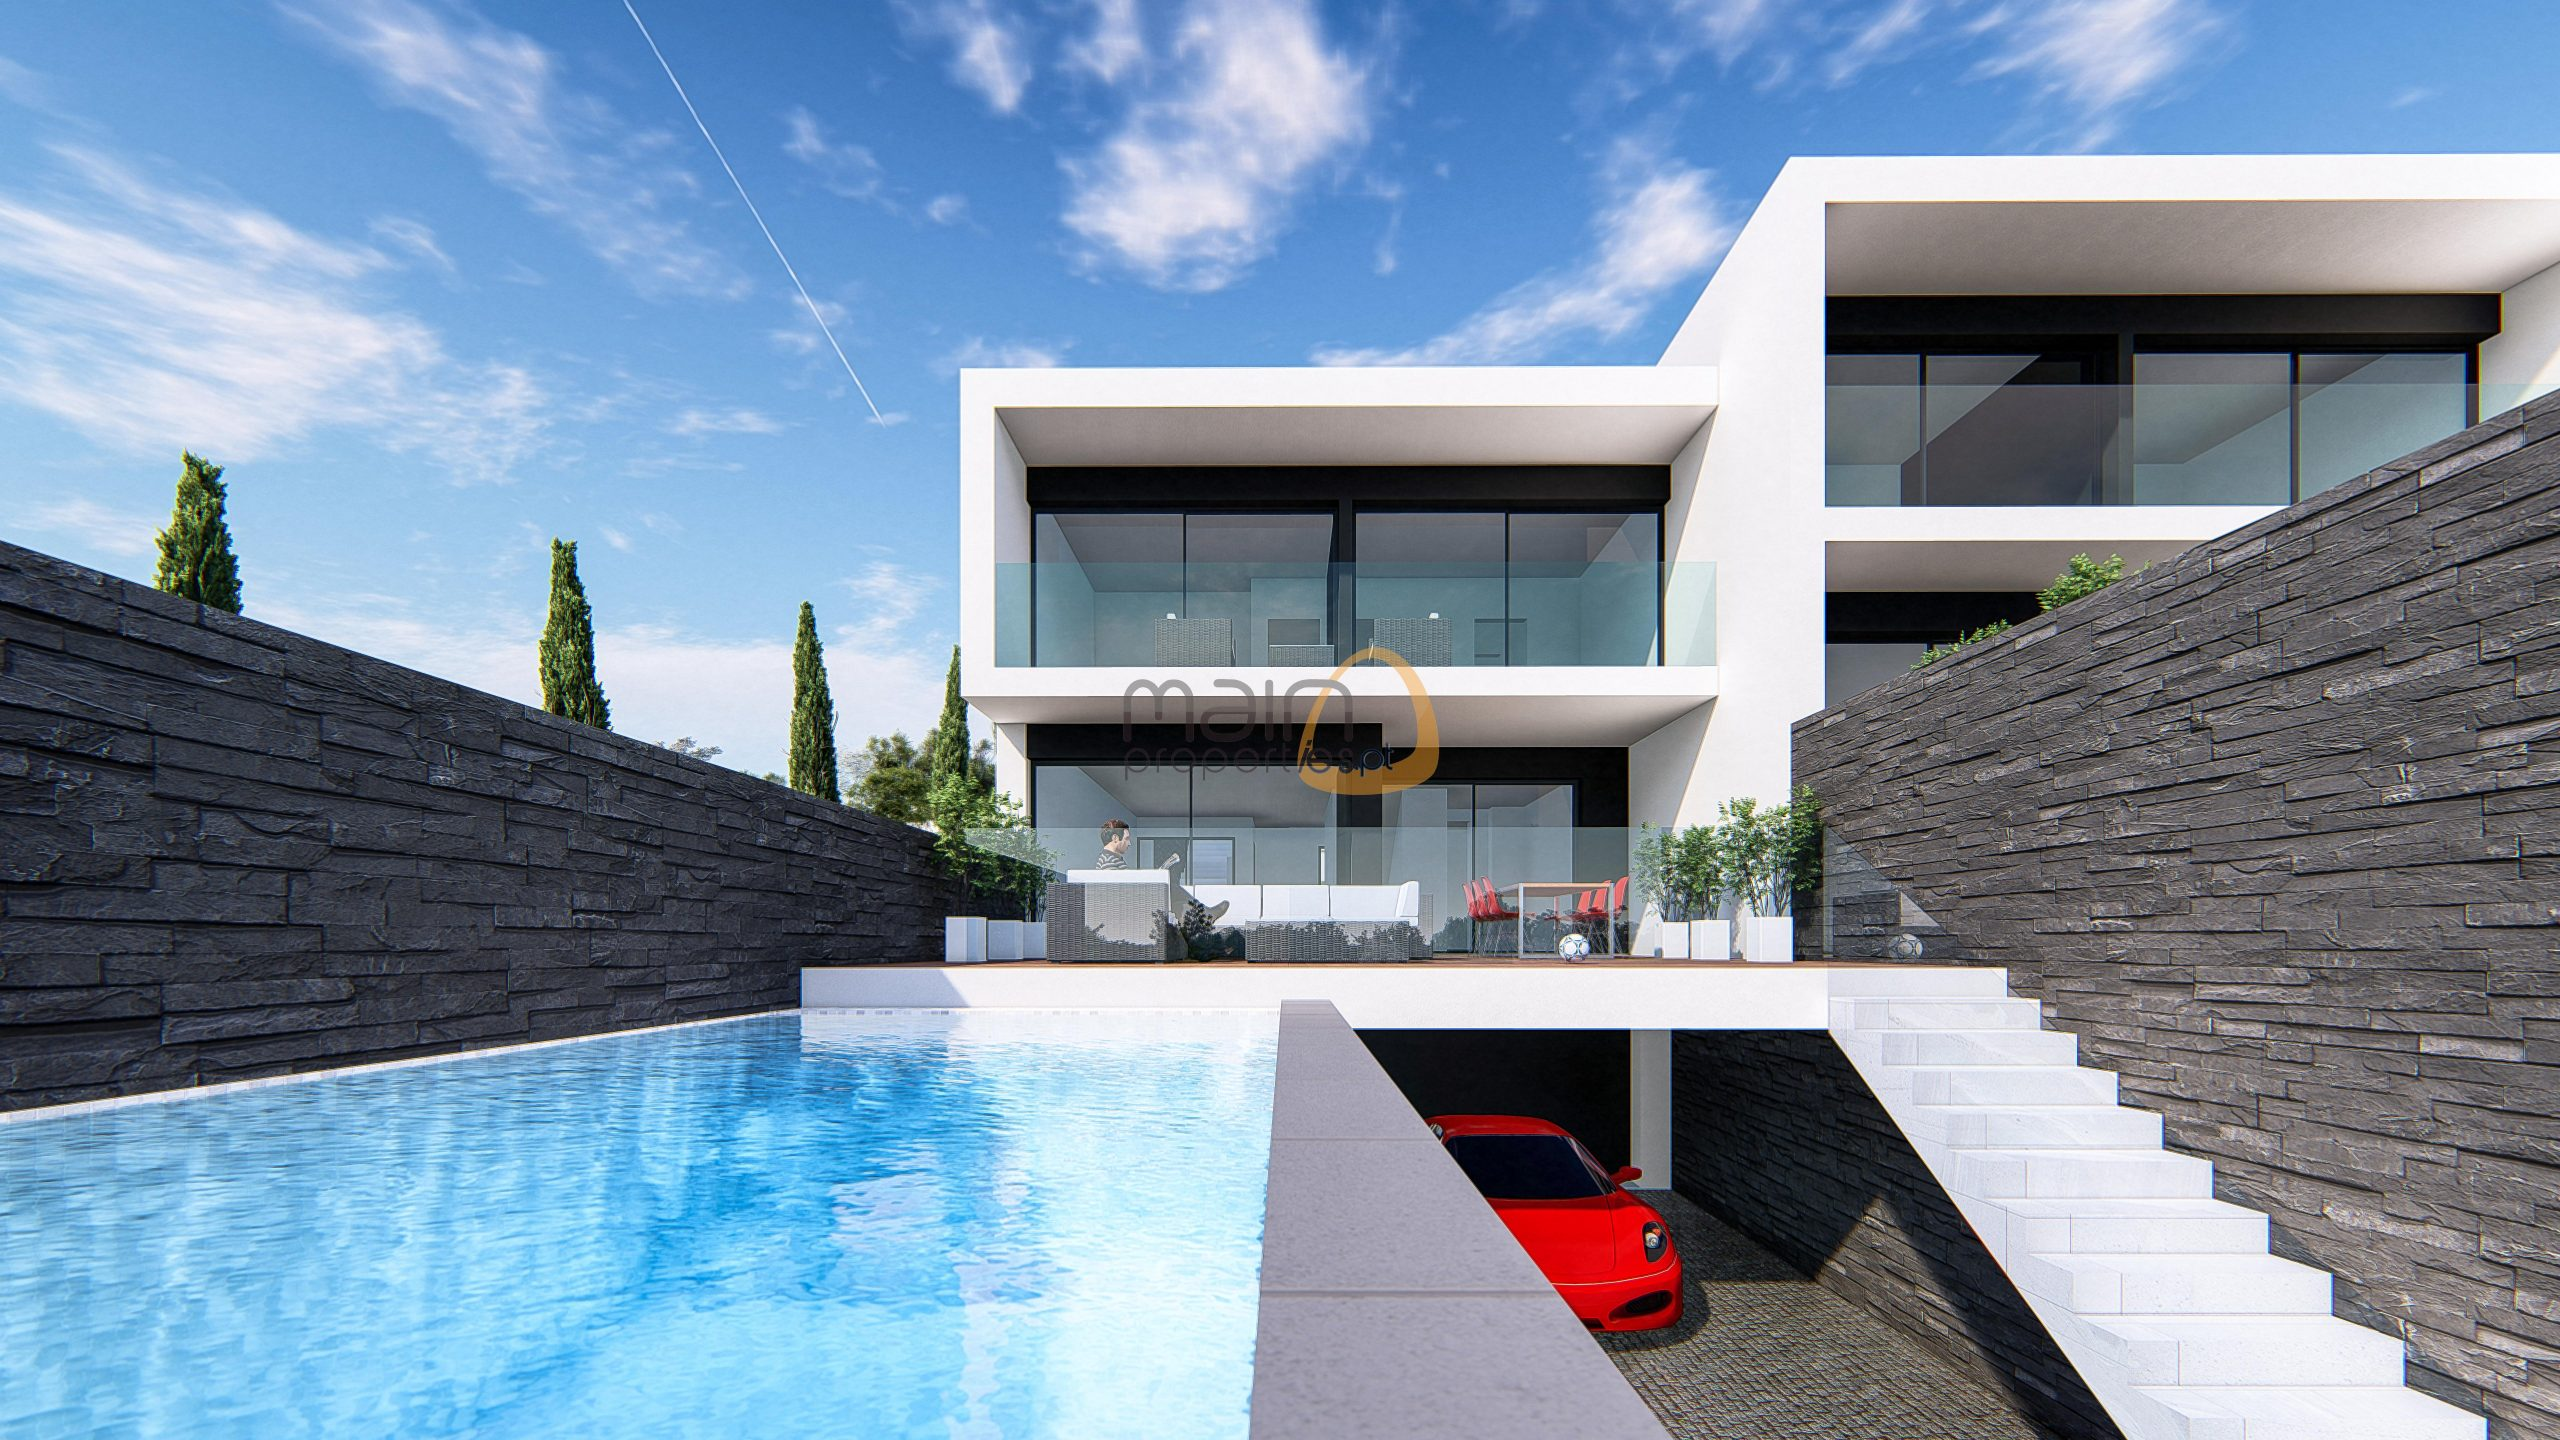 land-for-development-of-eleven-villas-with-sea-views-in-almancil-algarve-portugal-property-real-estate-10